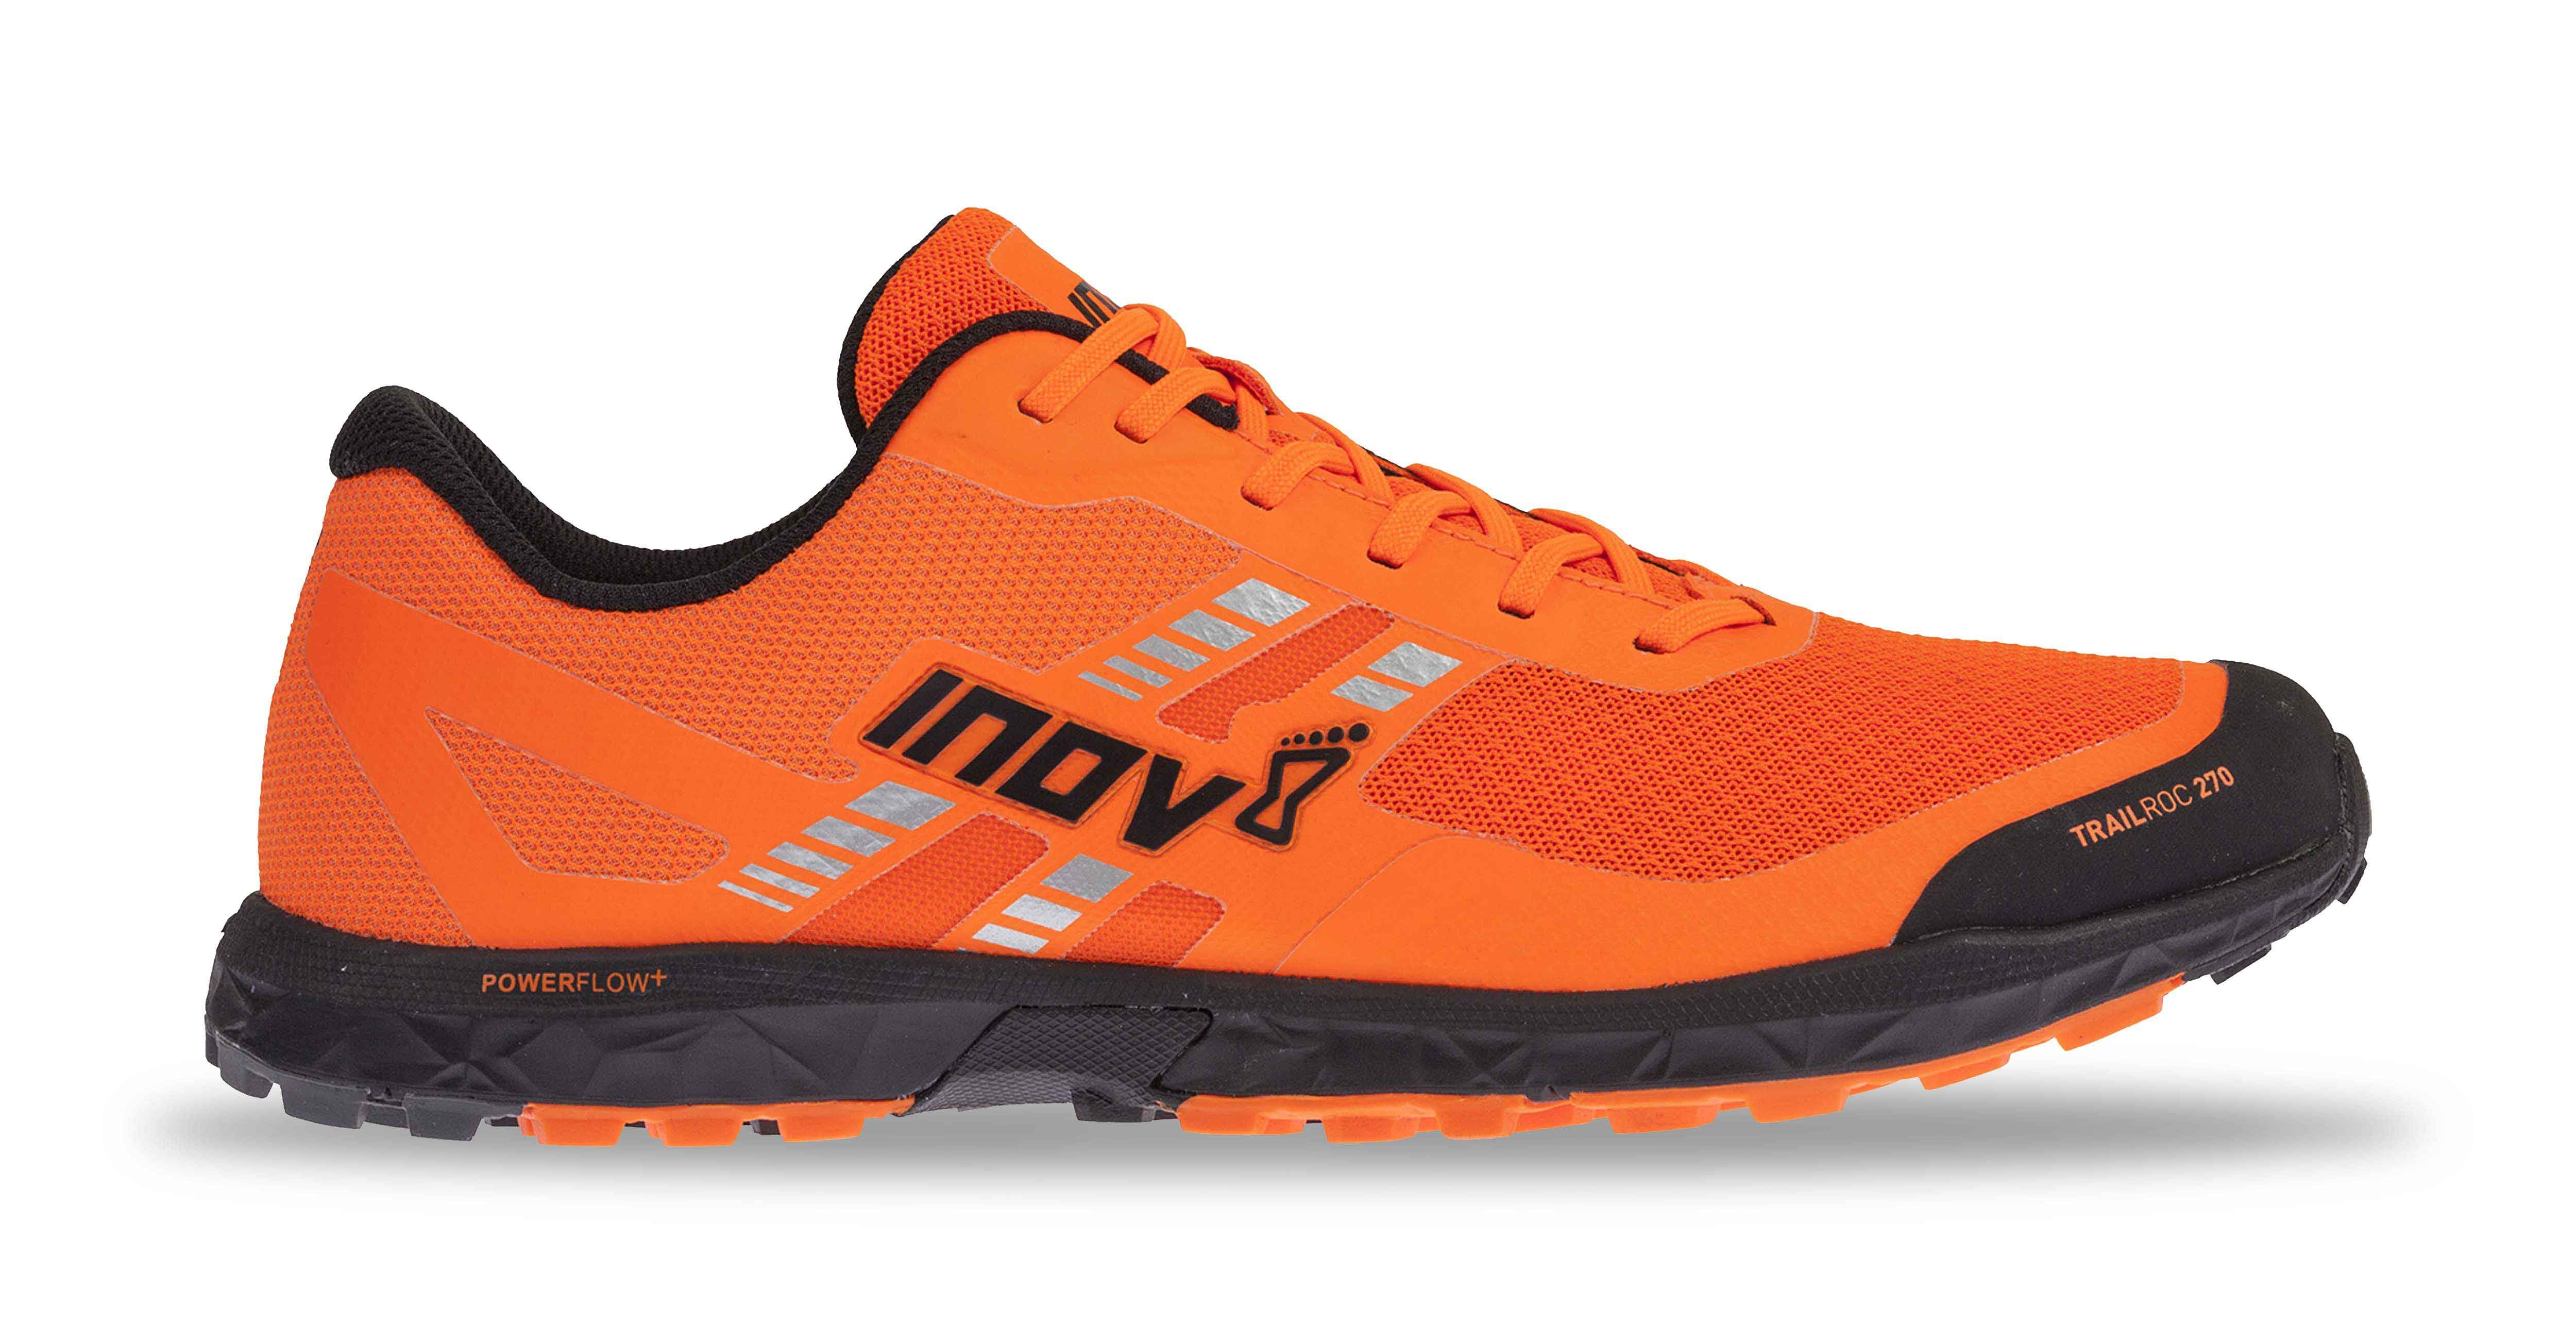 Trailroc 270 Men's Running Shoe | inov-8